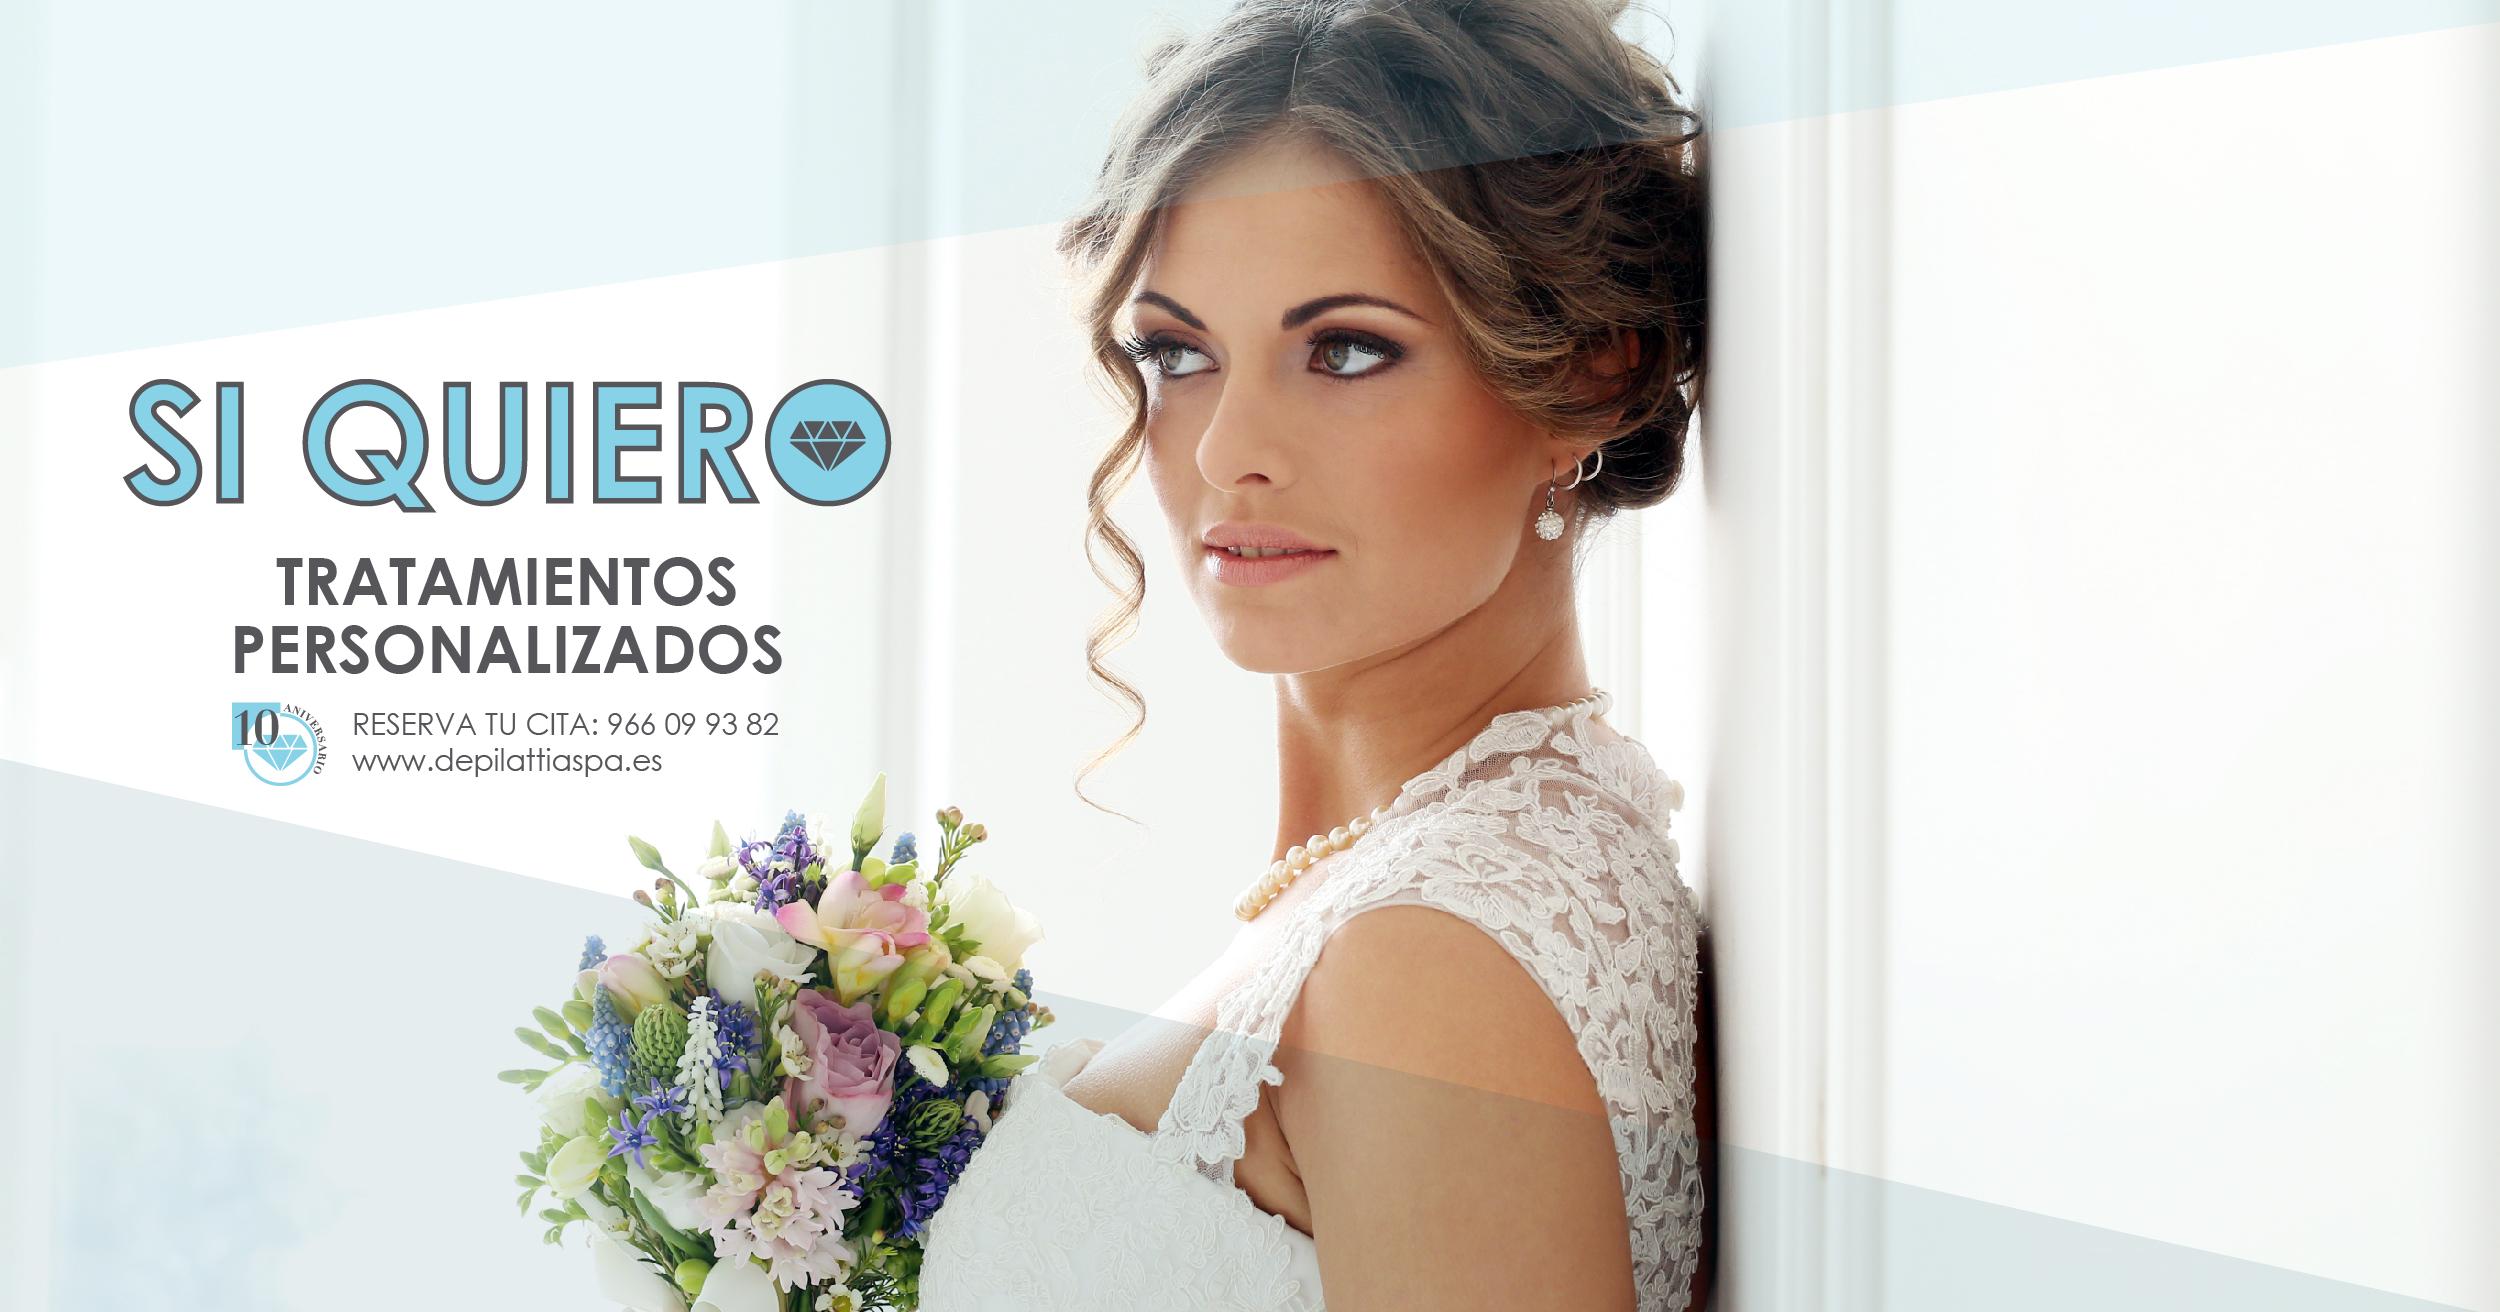 02-febrero-tratamientos-persoanlizados-bodas-depilattia-spa-elche-ruben-mendez_Facebook-post